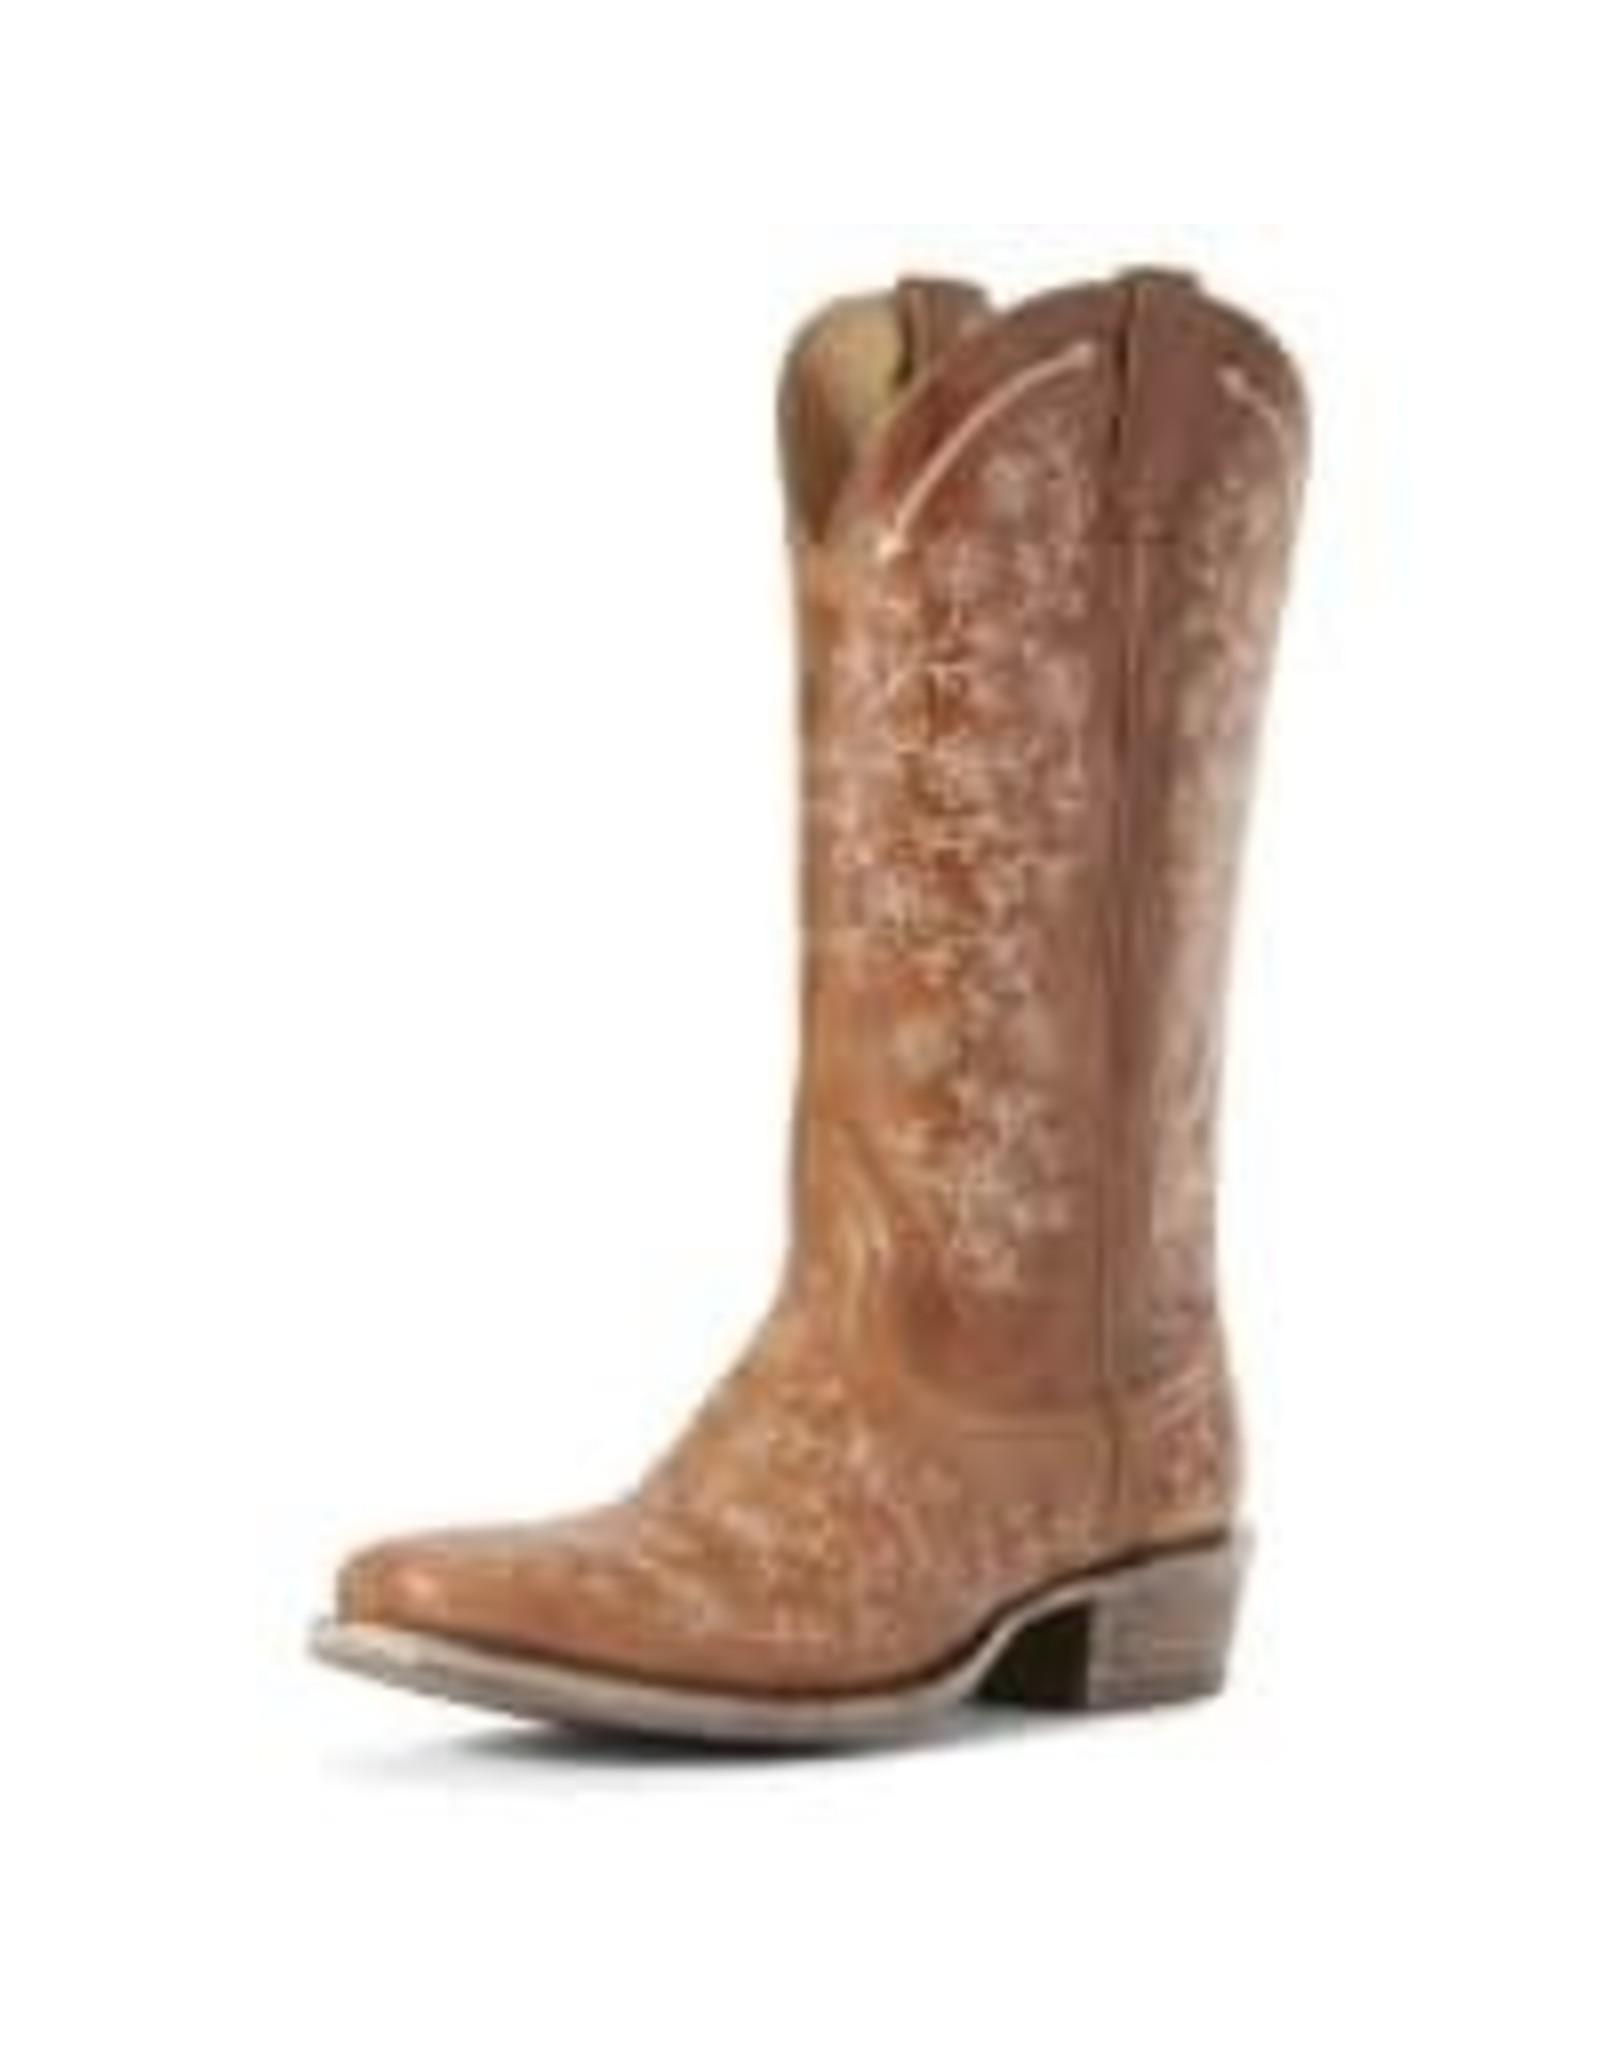 Boots-Women Ariat Womens Performance Fleur Cashew Cowgirl Boot 10027366